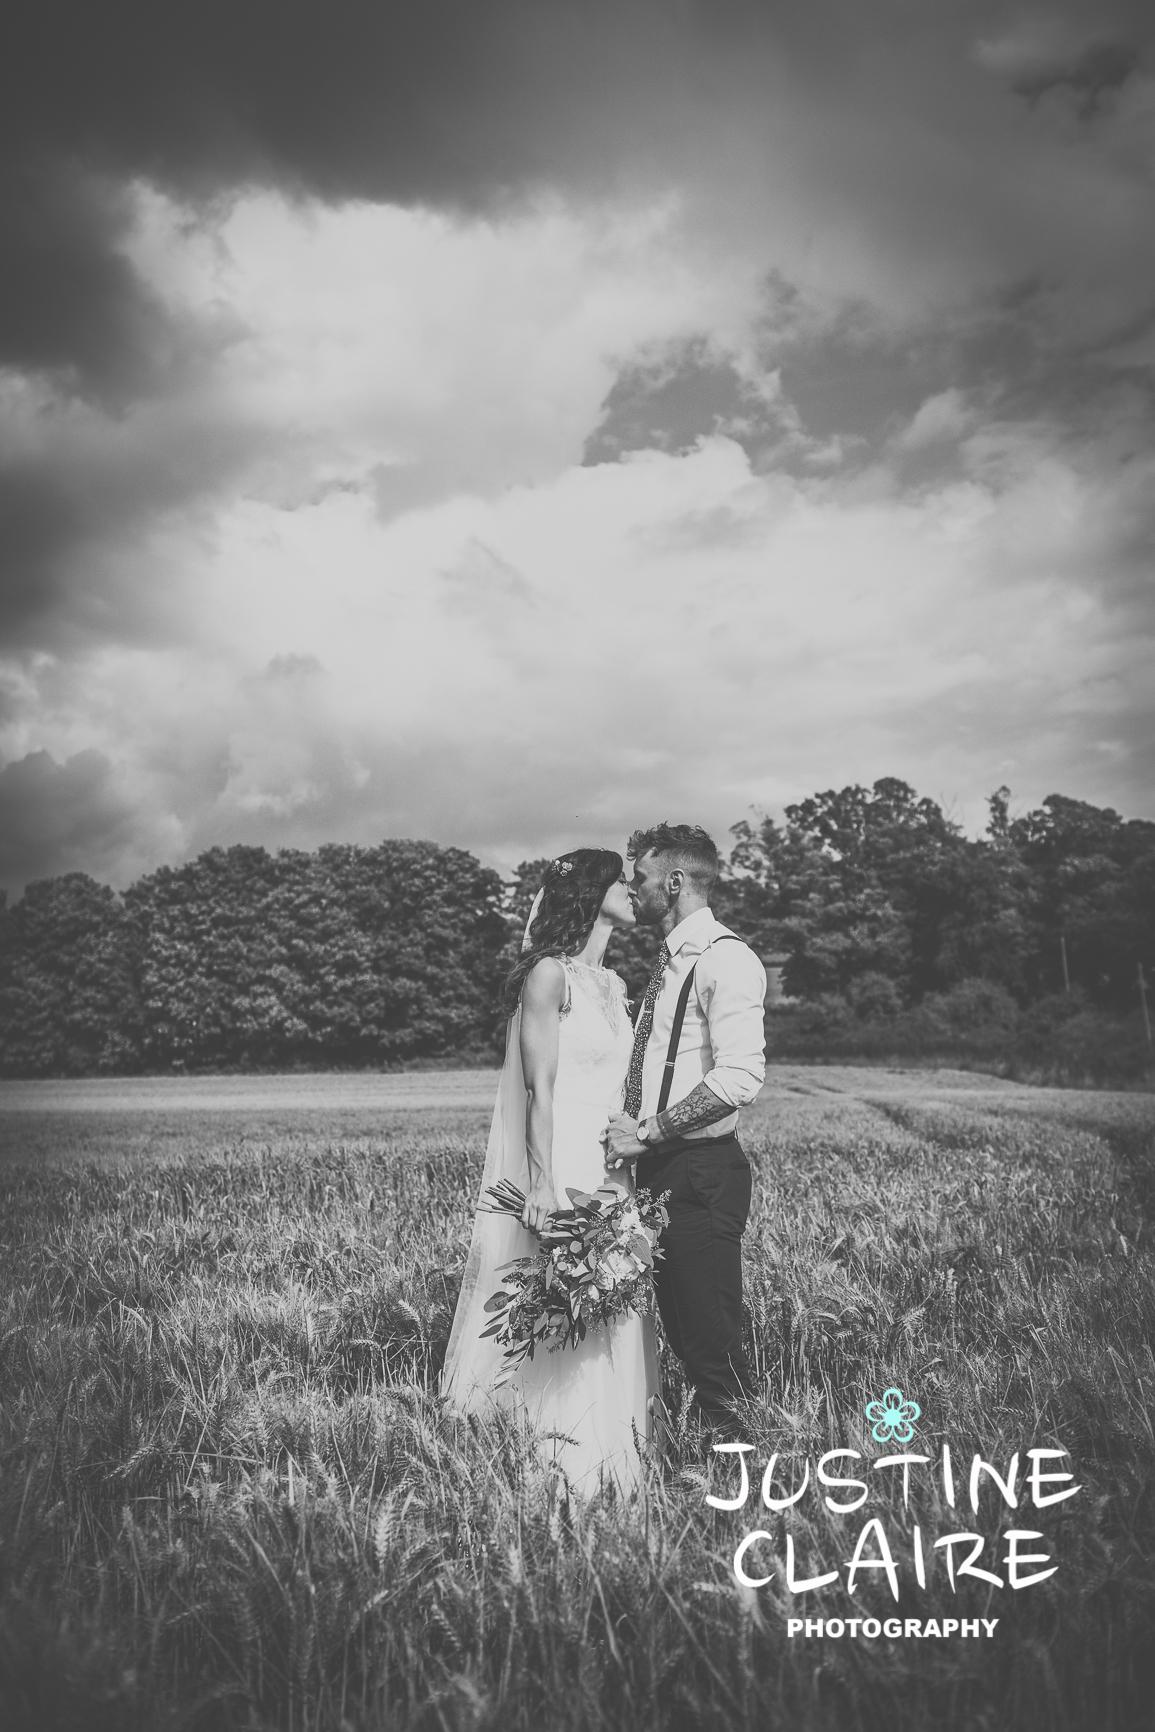 Farbridge Wedding Photographers Justine Claire Photography Chichester7.jpg